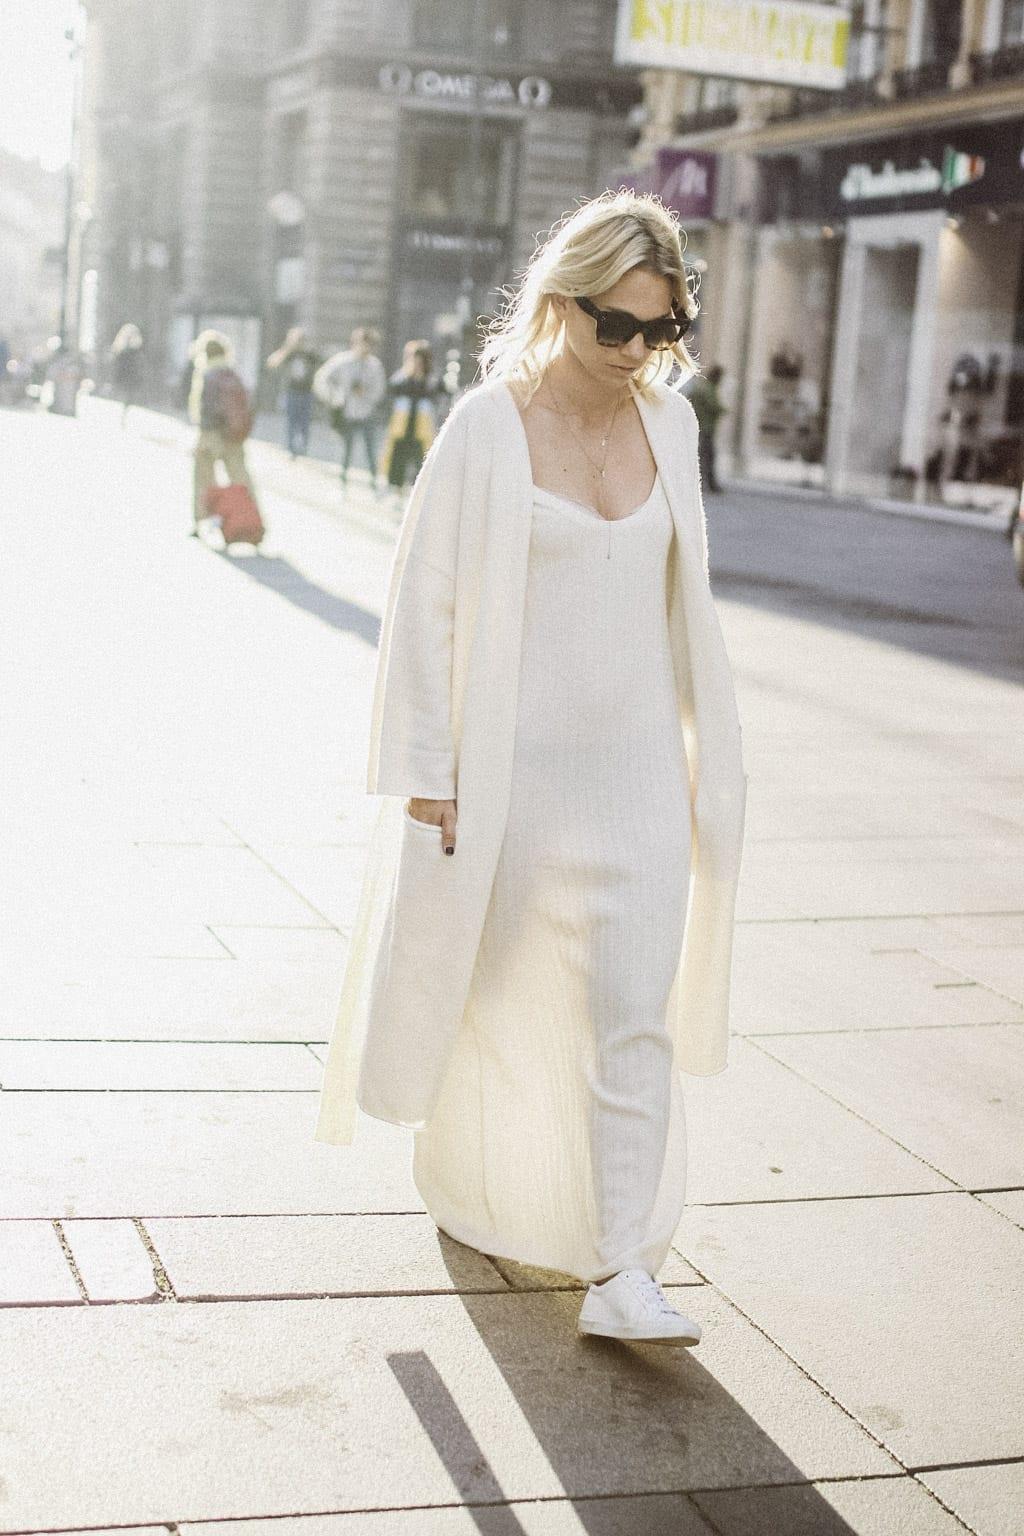 ck-constantlyk-com-karin-kaswurm-cashmere-outfit-zara-8923